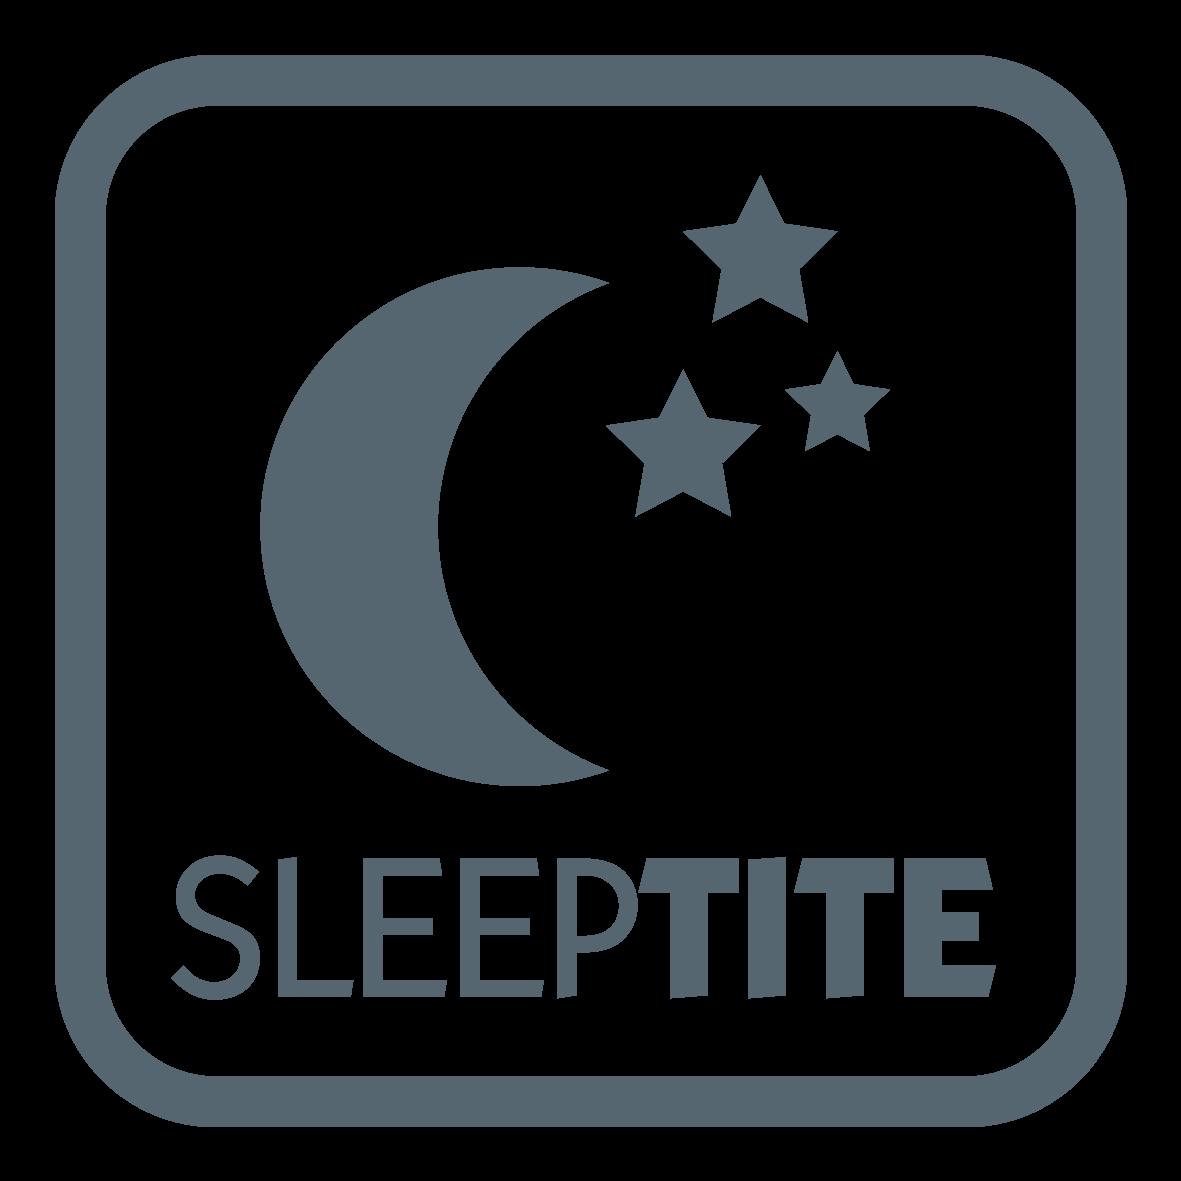 SleepTite